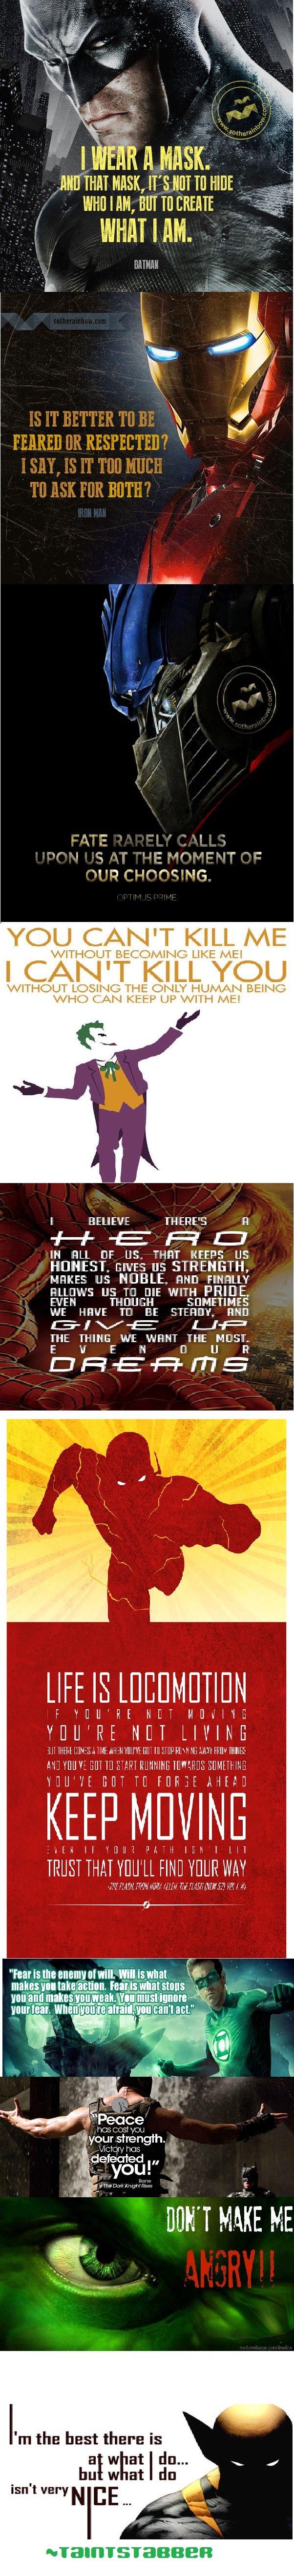 Super Heroes/Villains Quotes Comp. Part 2 maybe?. MID THAT MINI, IT' S Ill HIDE mm HIM, lloll Ill [IRENE I I WIT I HIT. Cruch' , YOU CAN' T KILL ME LIKE ME! I C super heroes villians